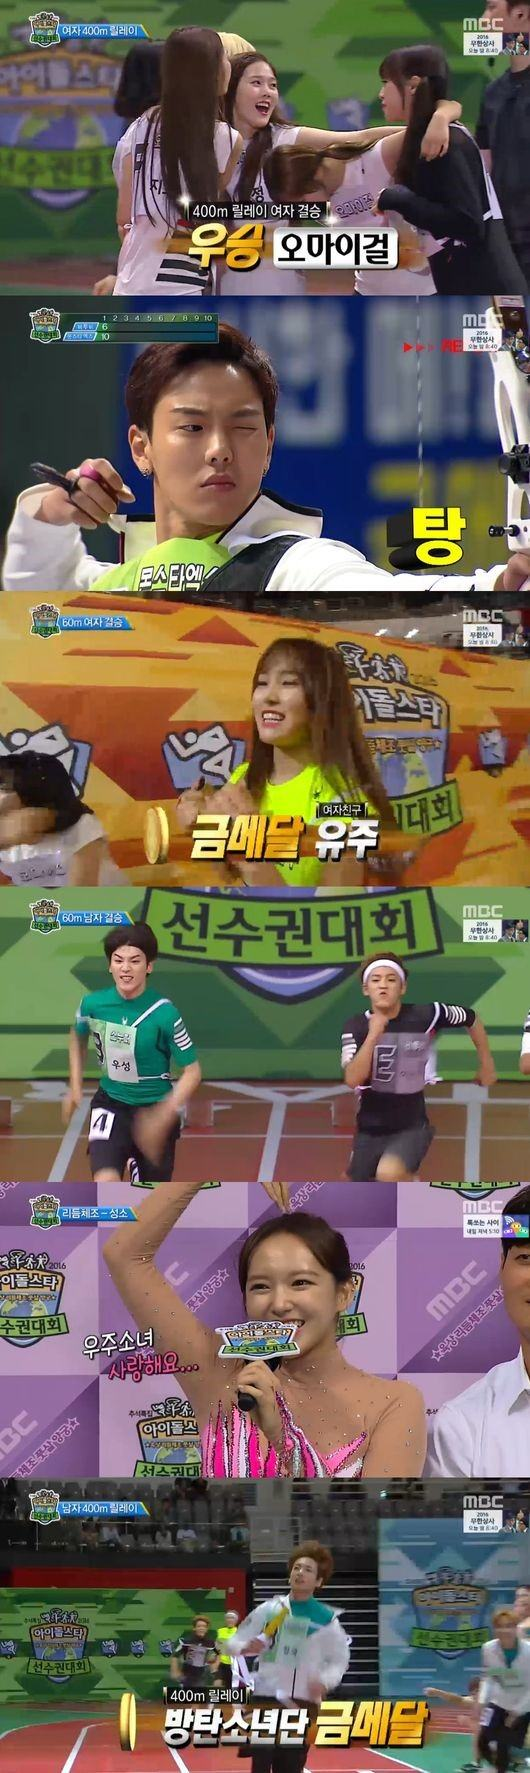 2016 Chuseok Special Idol Star Athletes Championships / OSEN